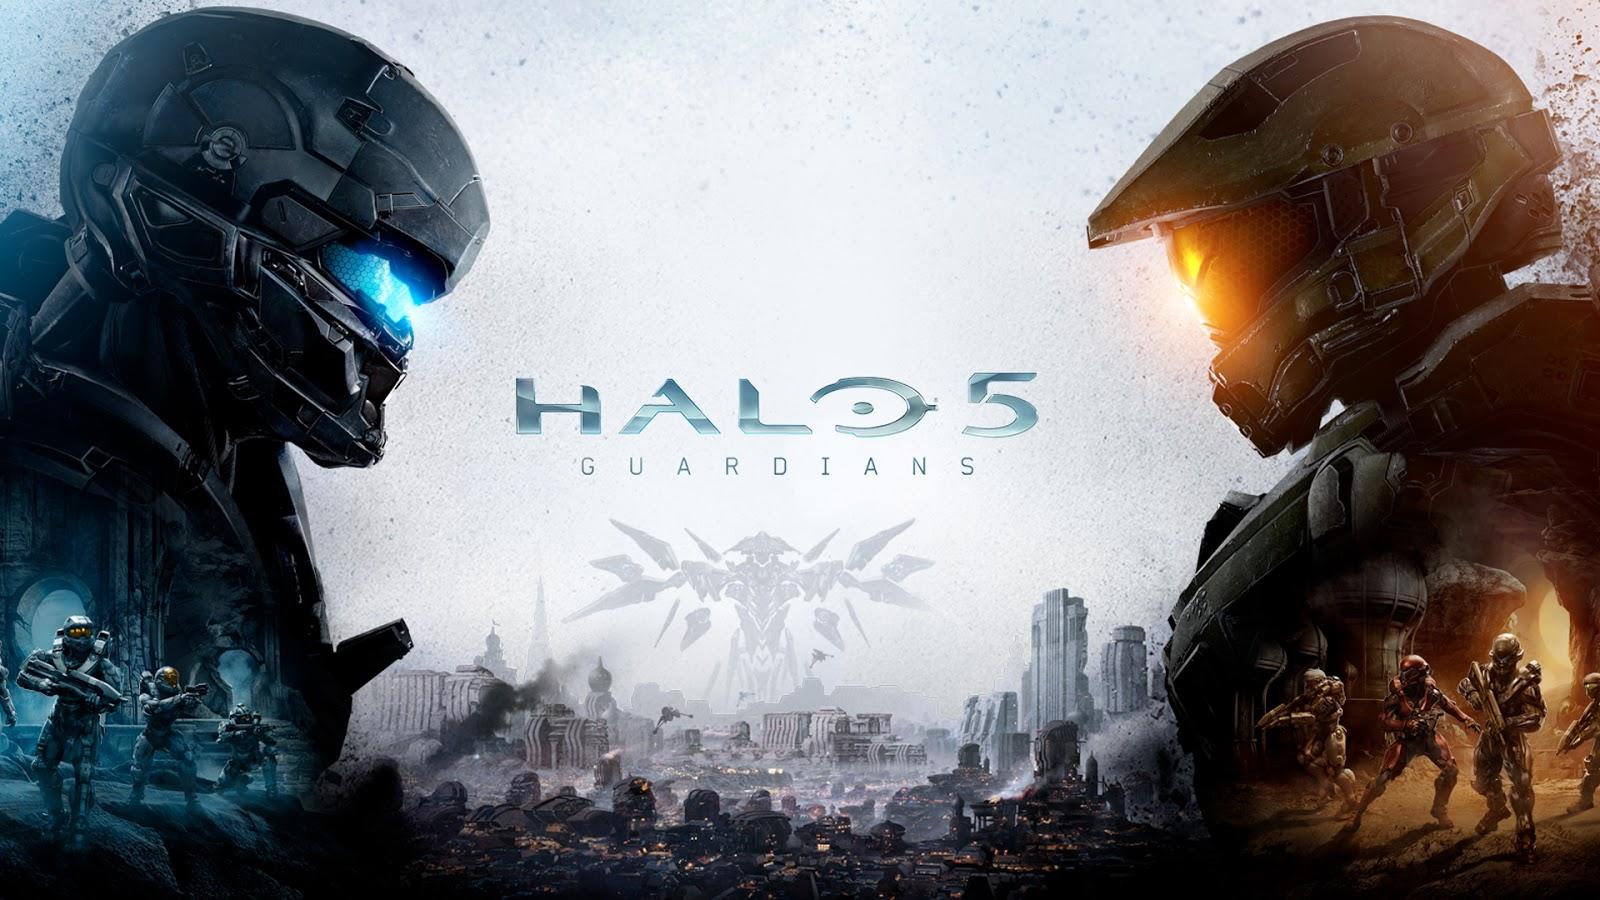 Las próximas entregas de Halo contarán con pantalla dividida